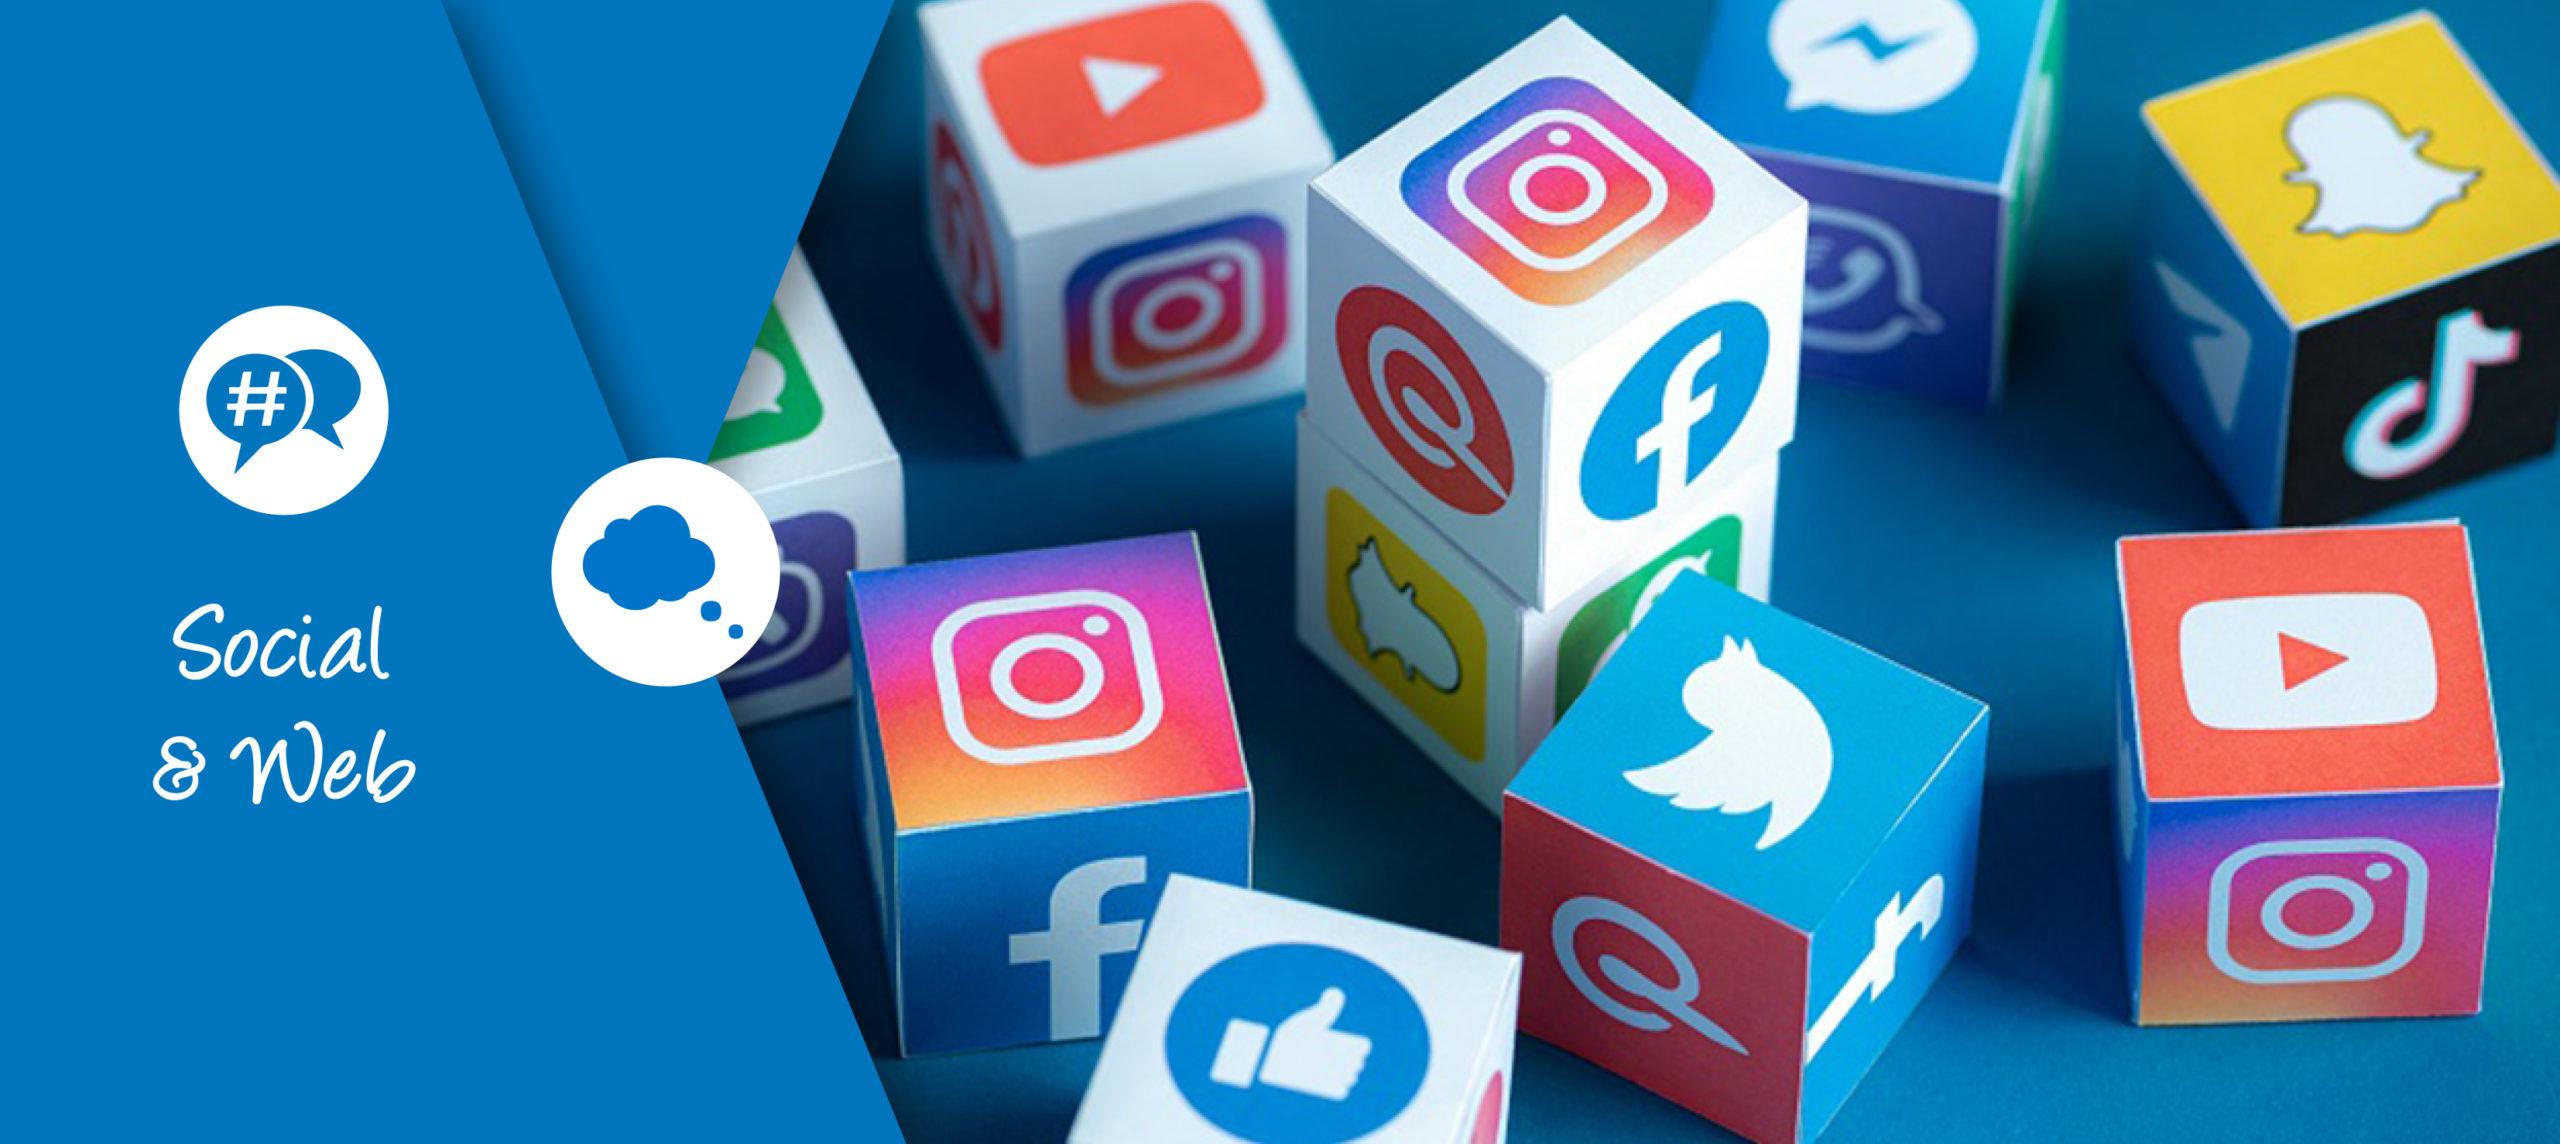 Social & Web